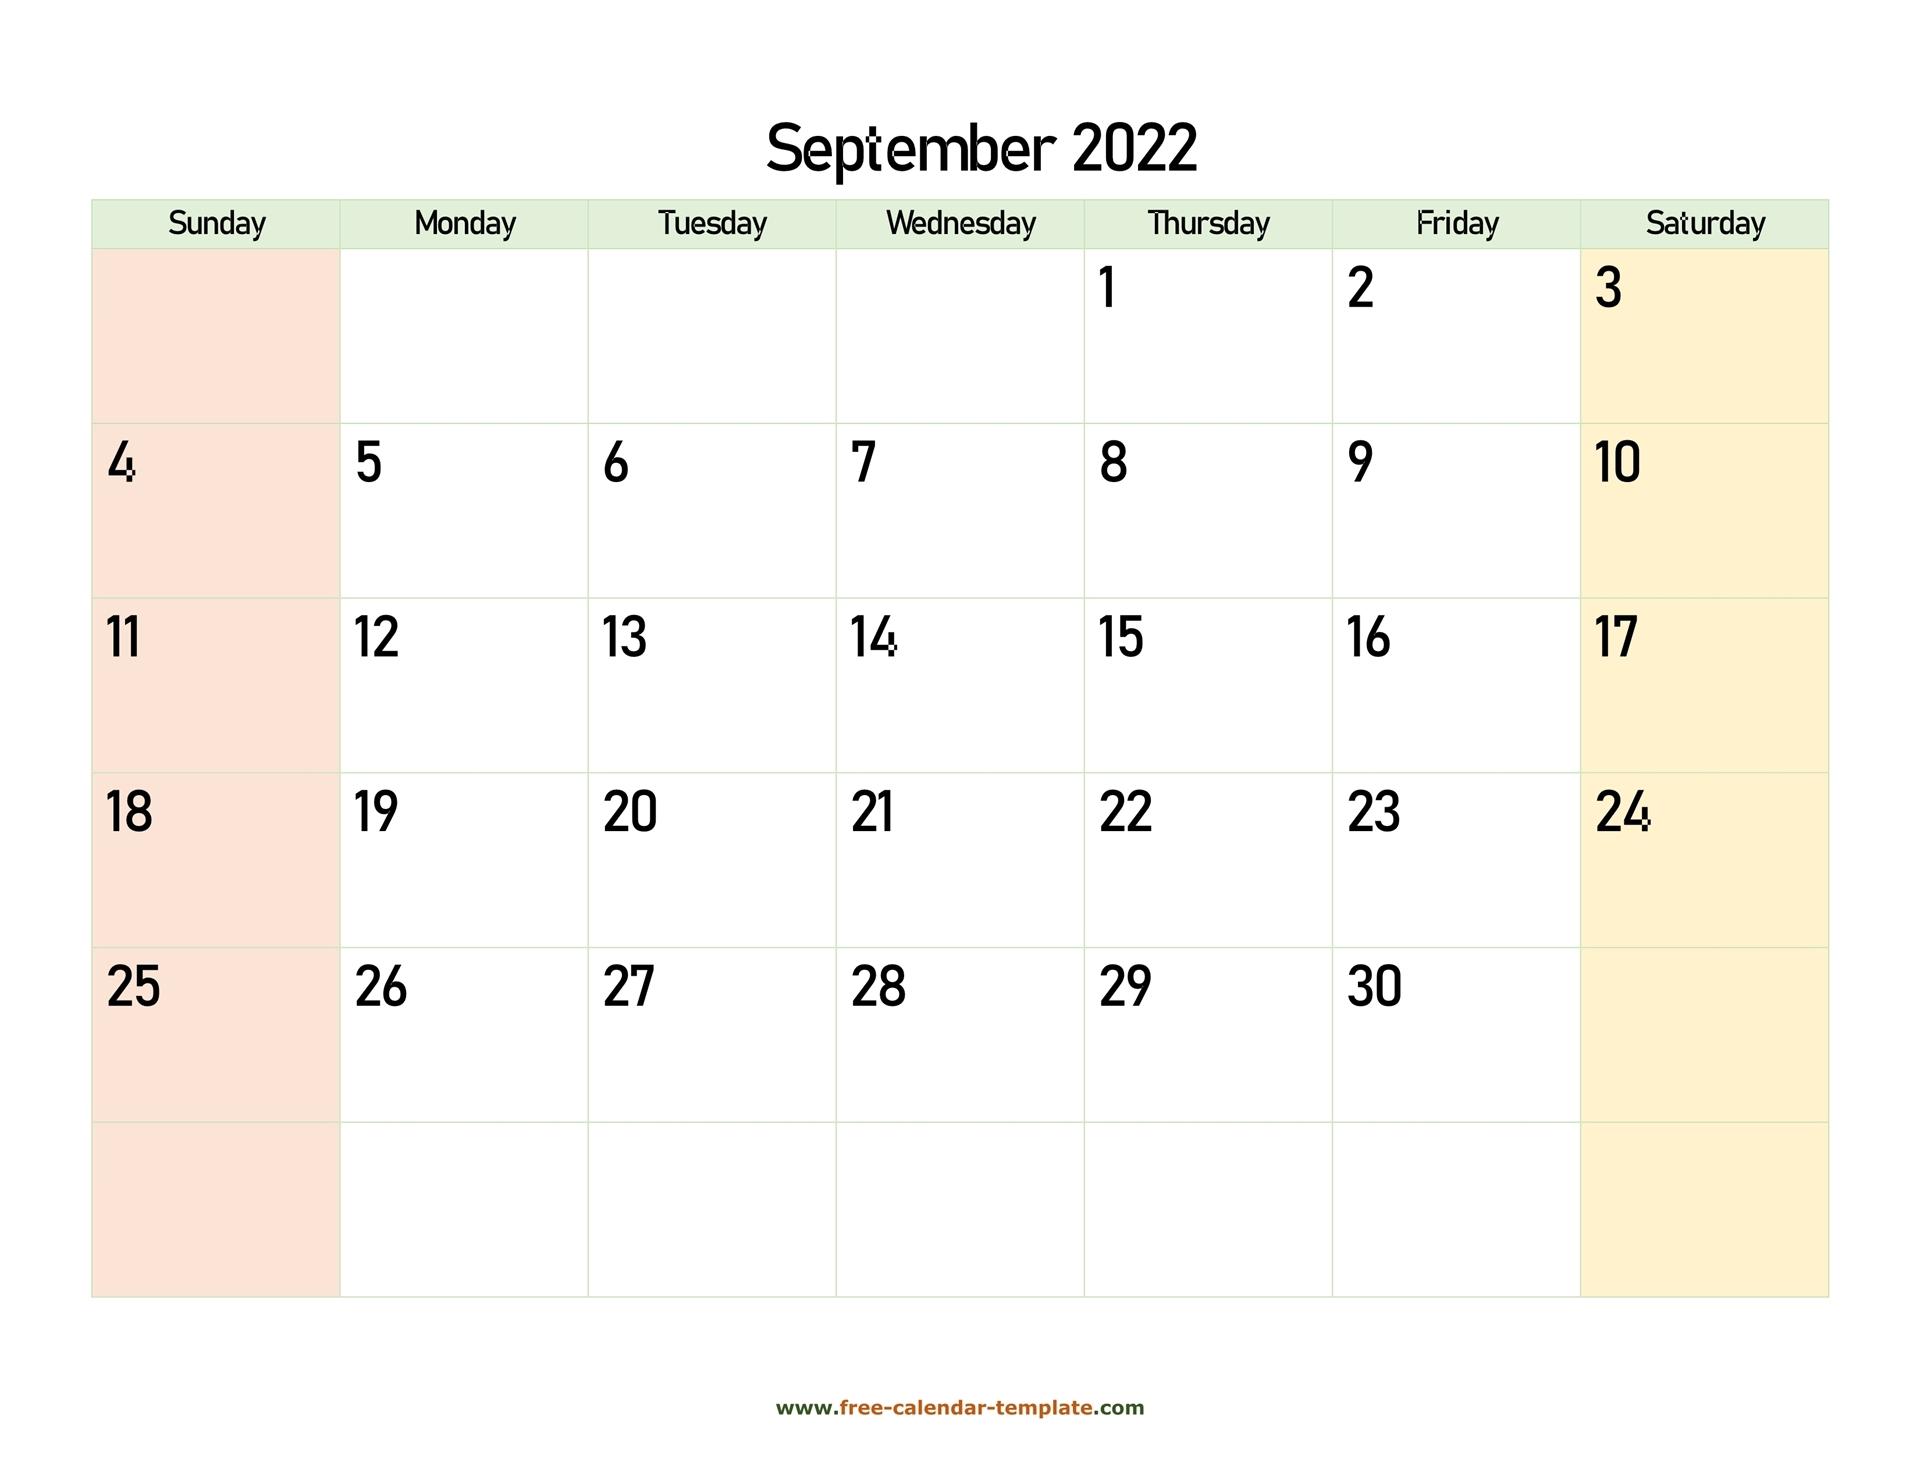 september 2022 free calendar tempplate free calendar template::September 2022 Cute Calendar Free